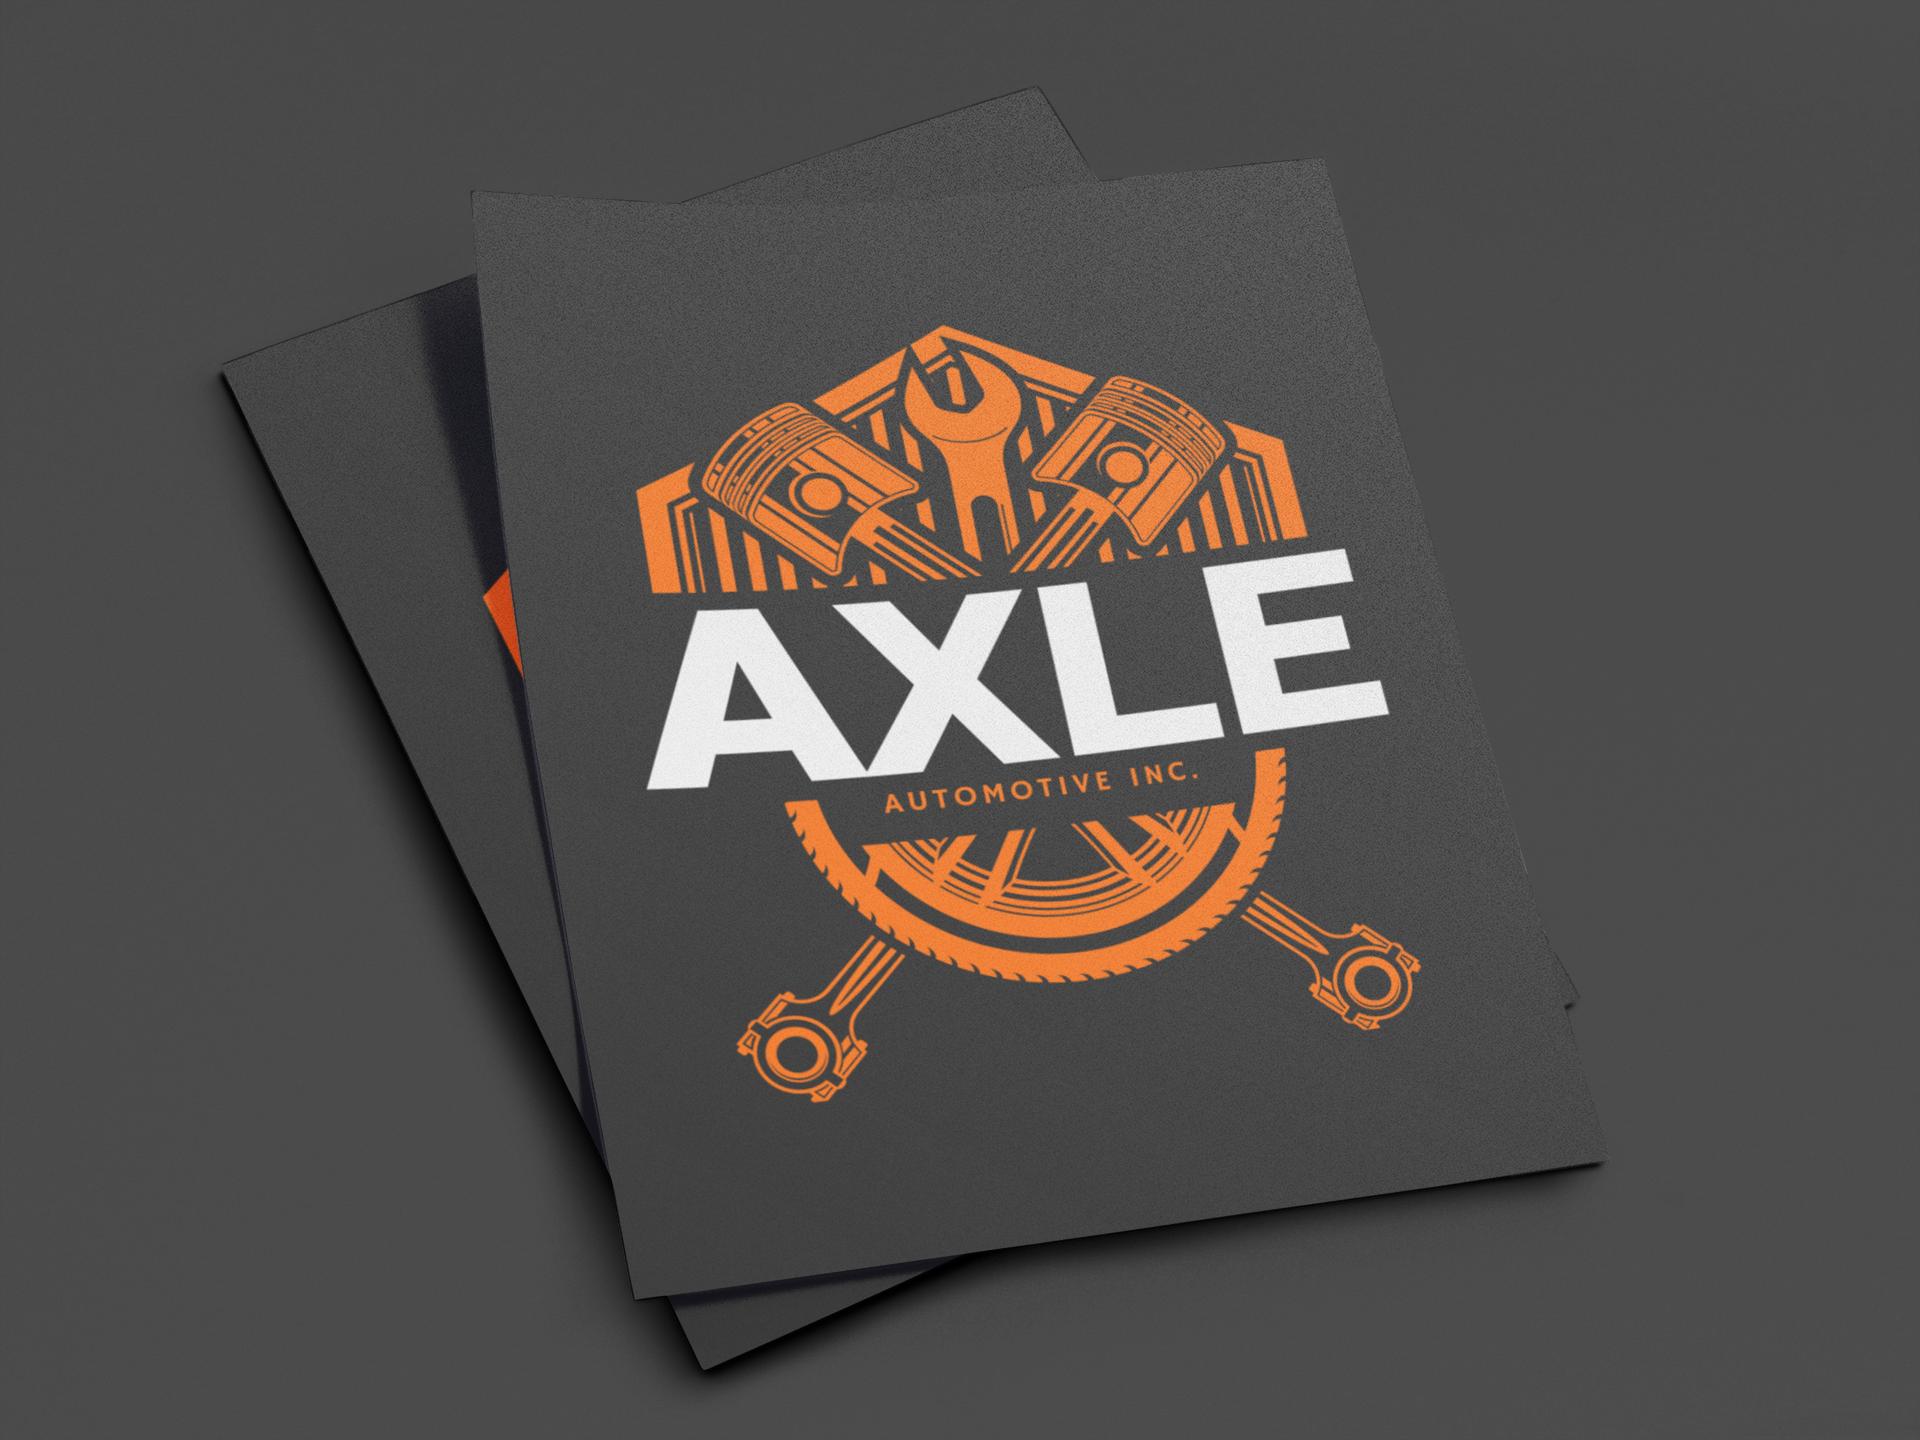 Axle Automotive Inc.